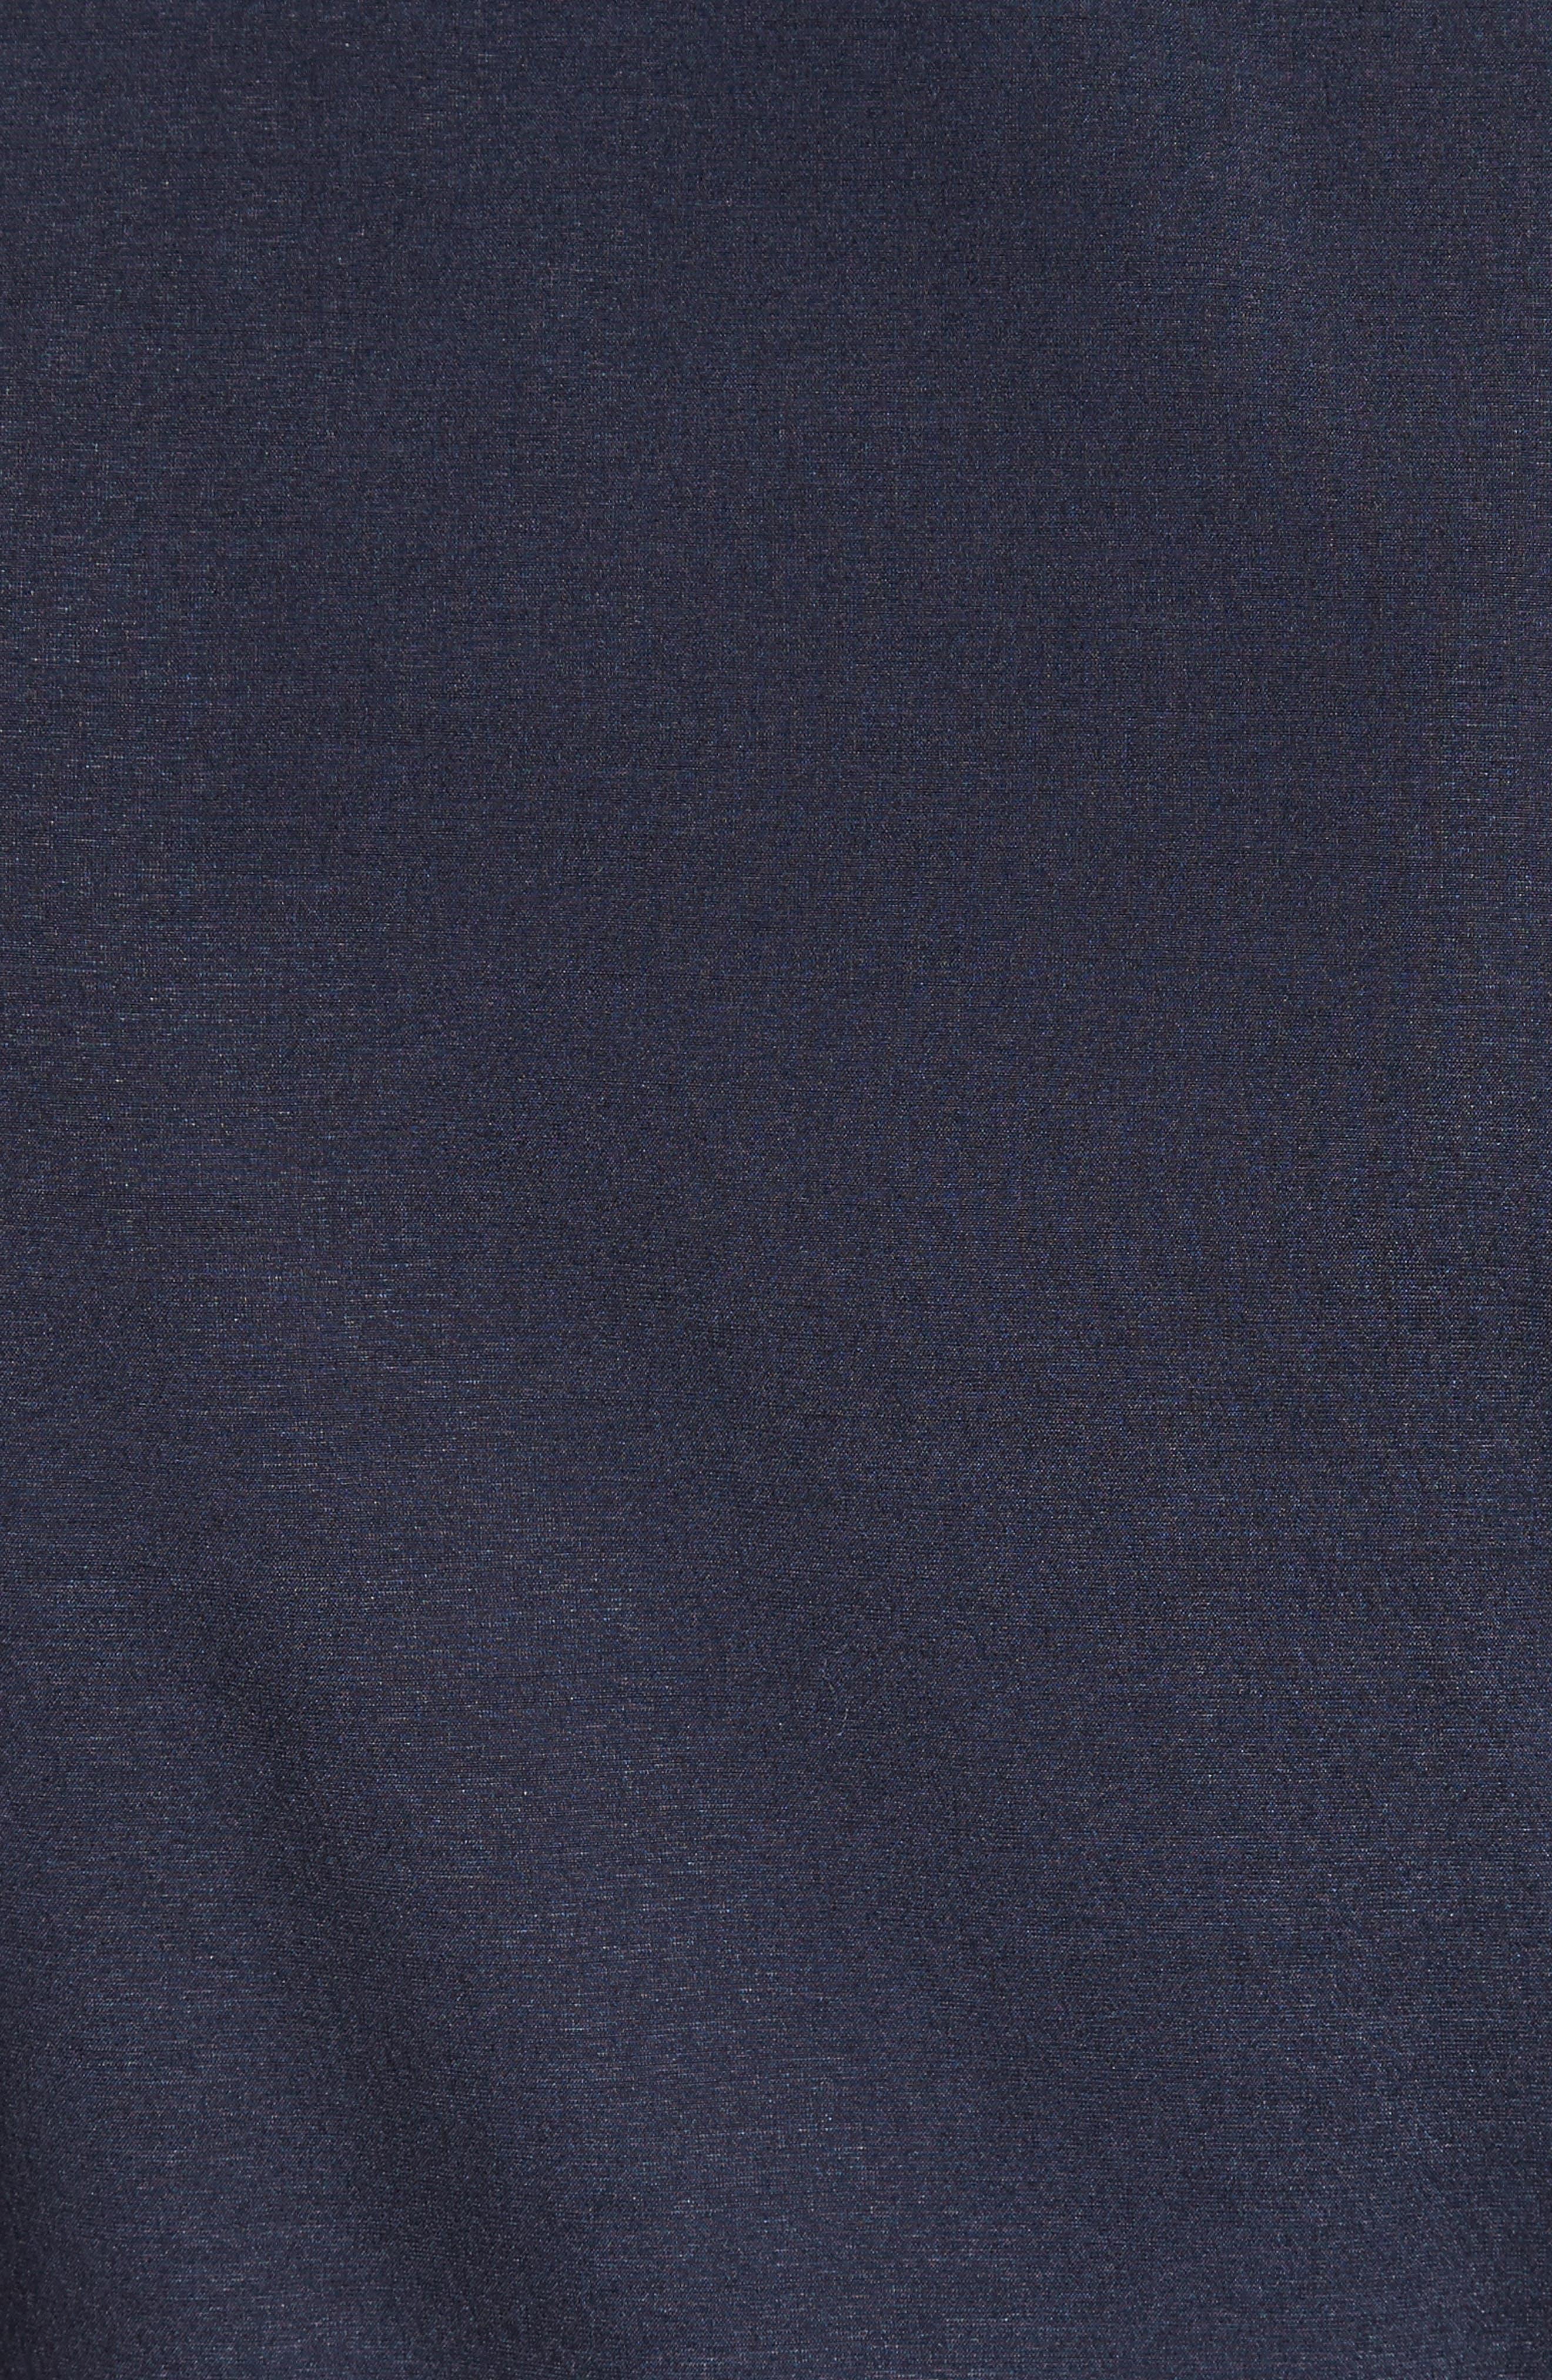 Alternate Image 3  - Max Mara Cinema Silk & Stretch Wool Top